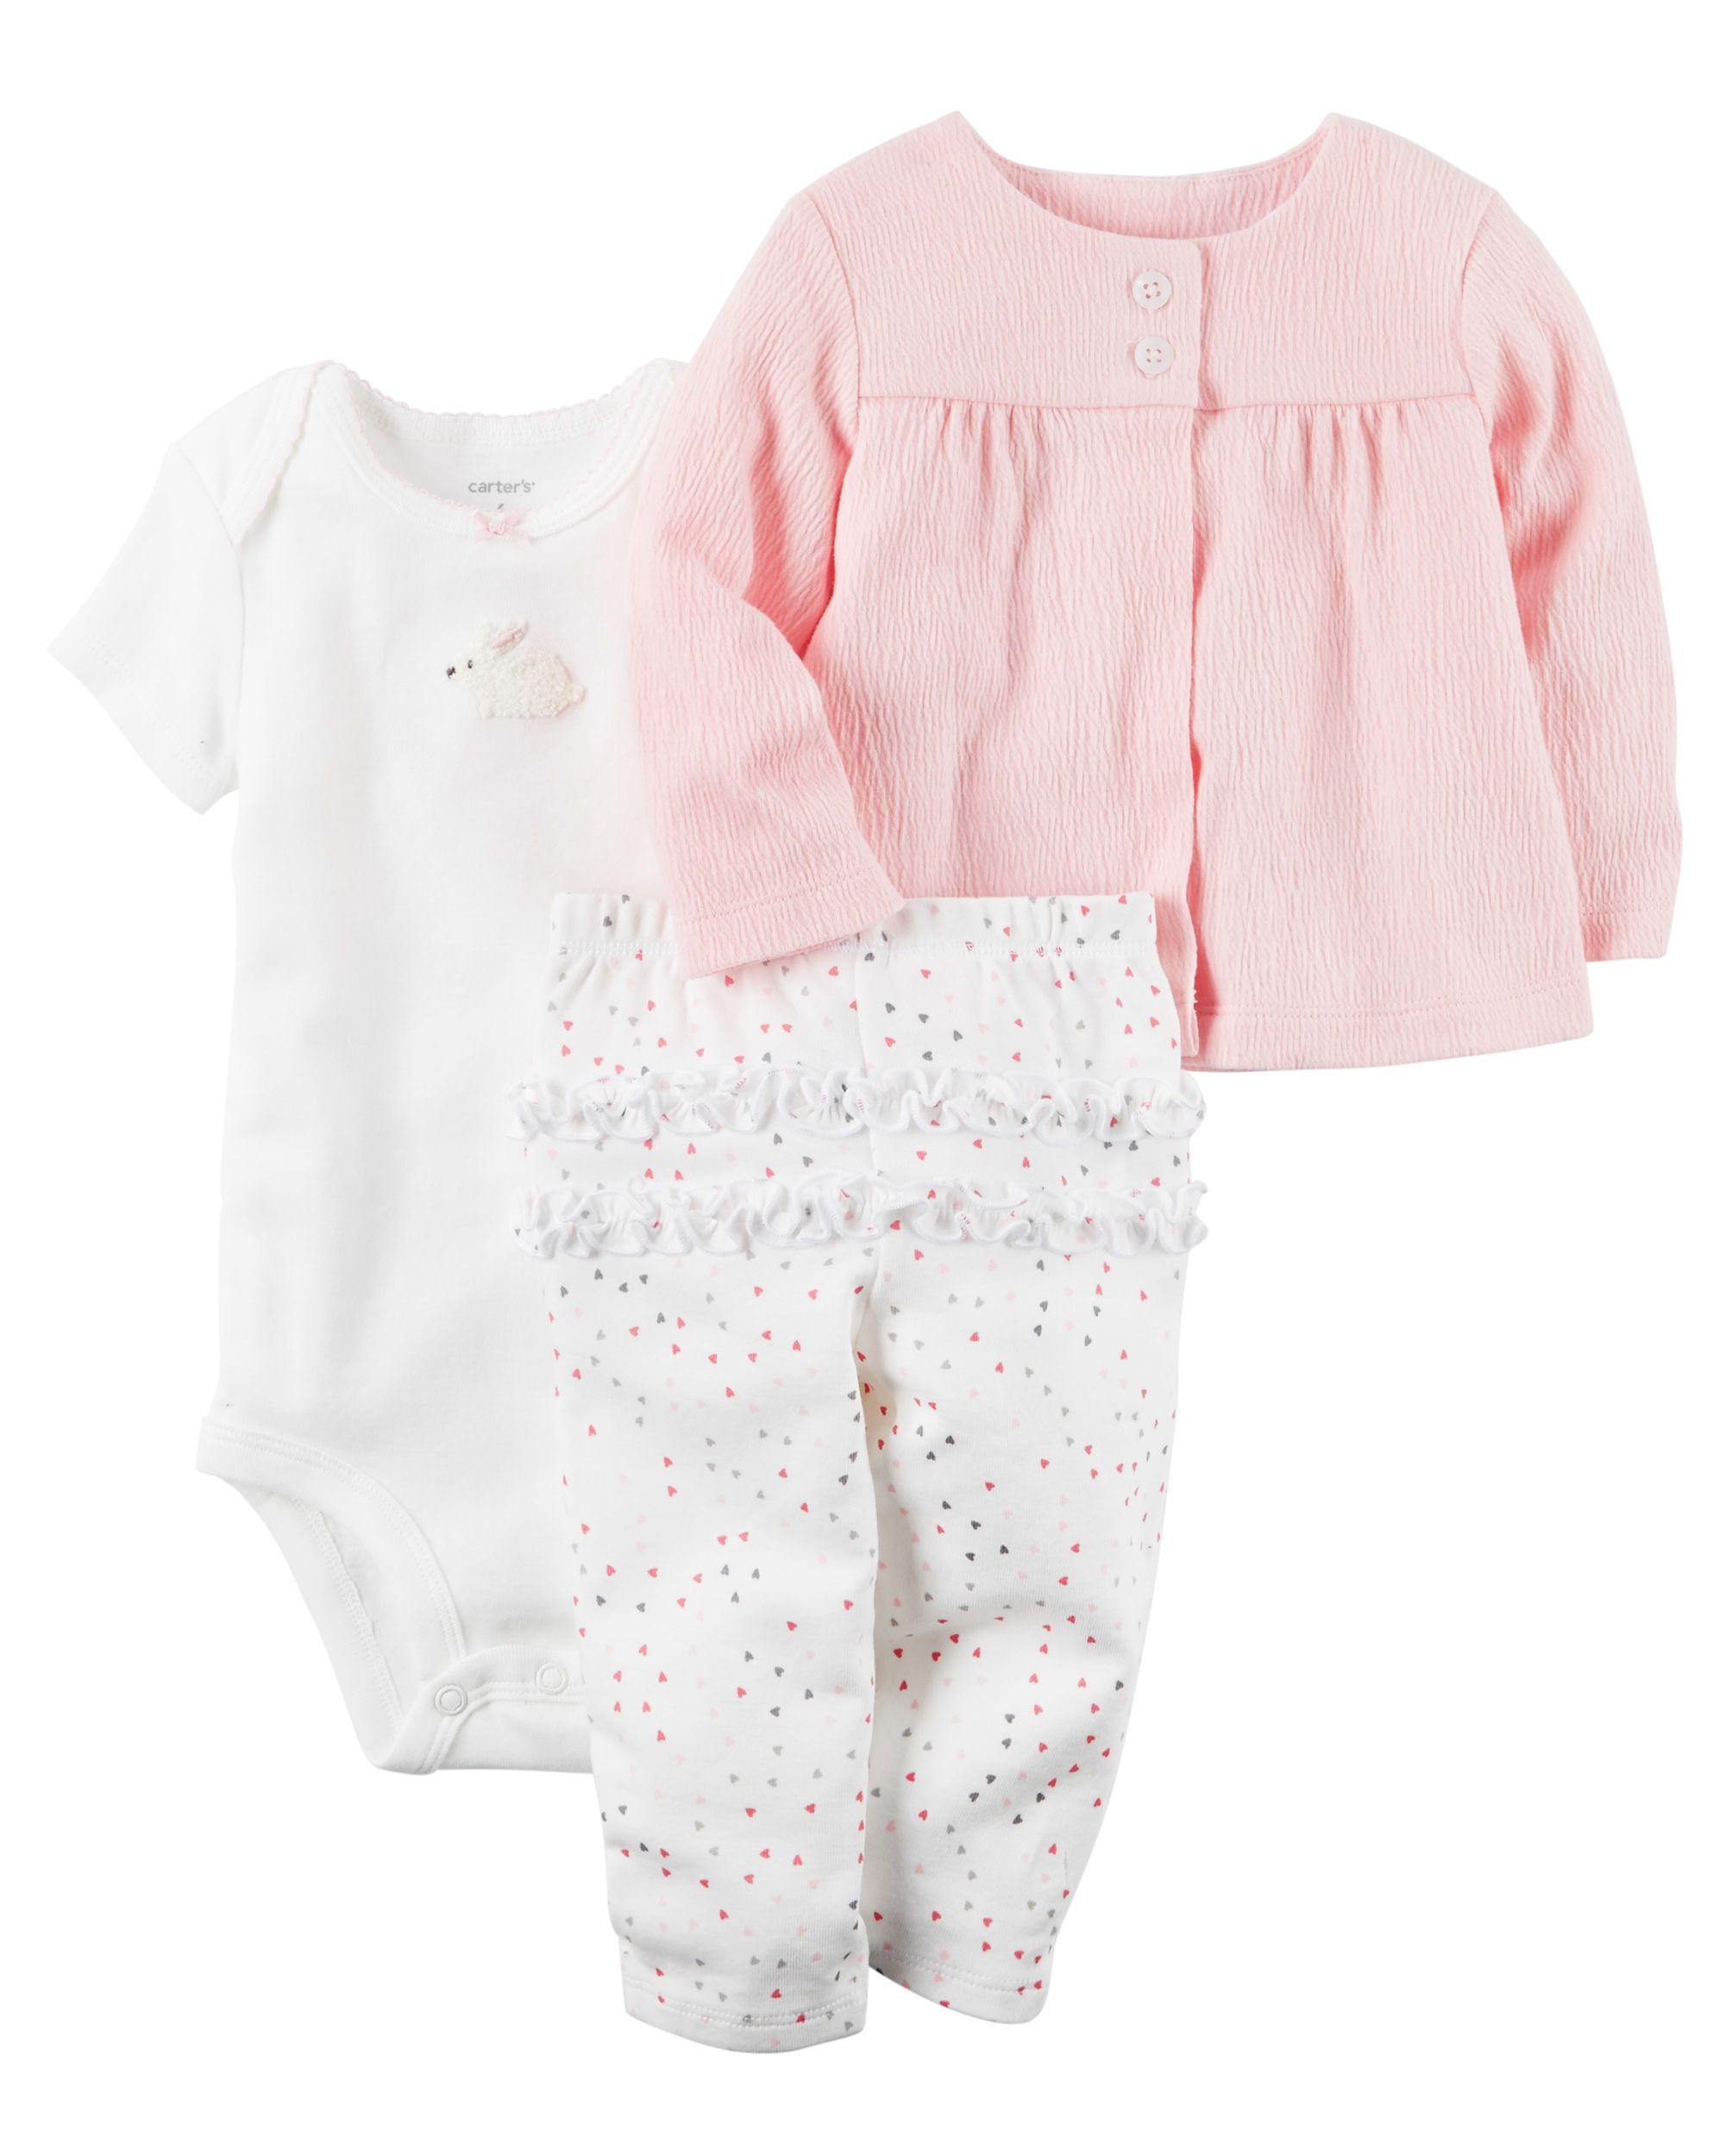 3 Piece Babysoft Little Jacket Set